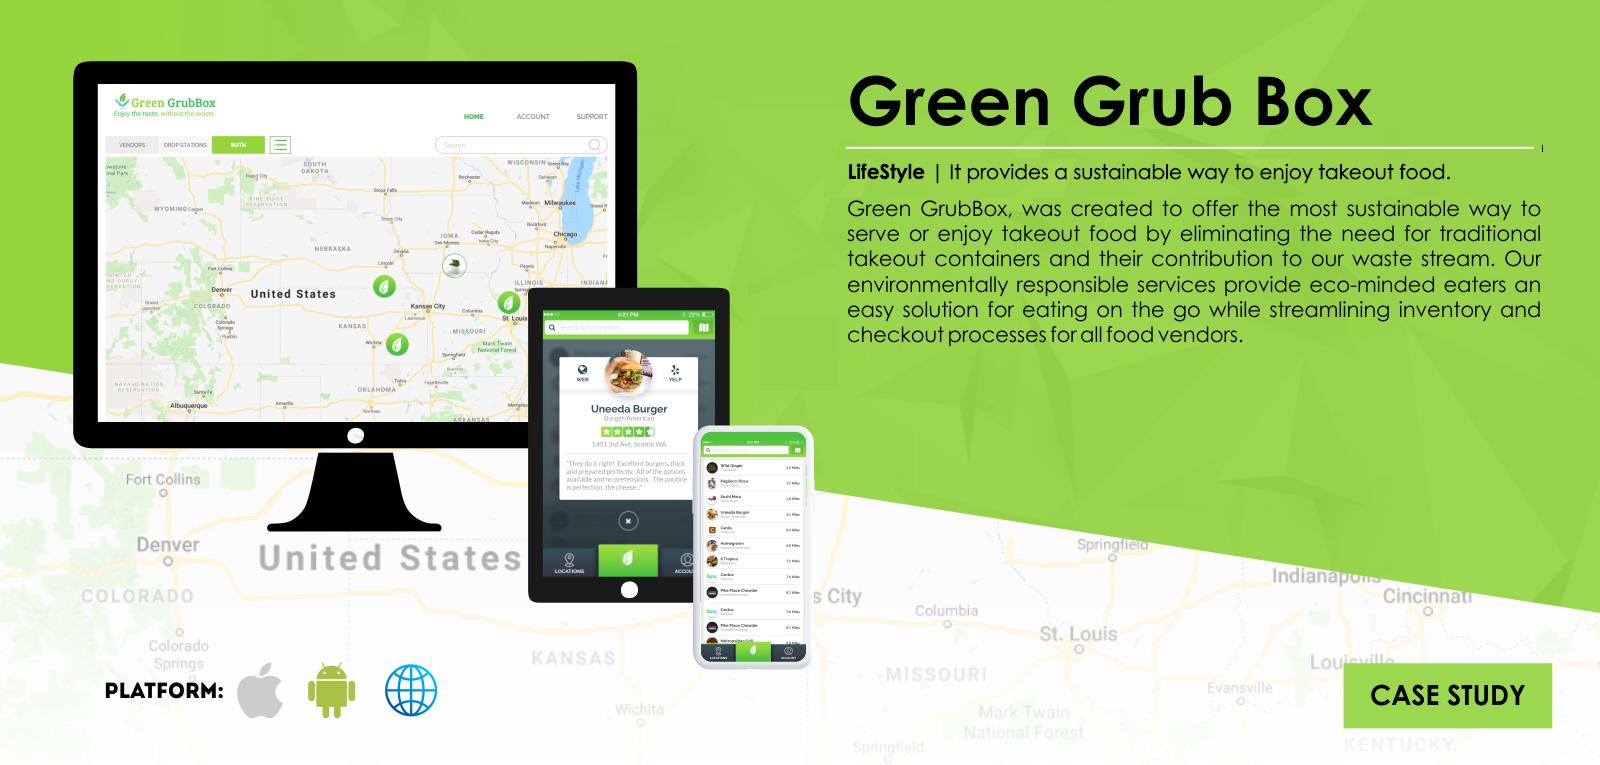 Green GrubBox